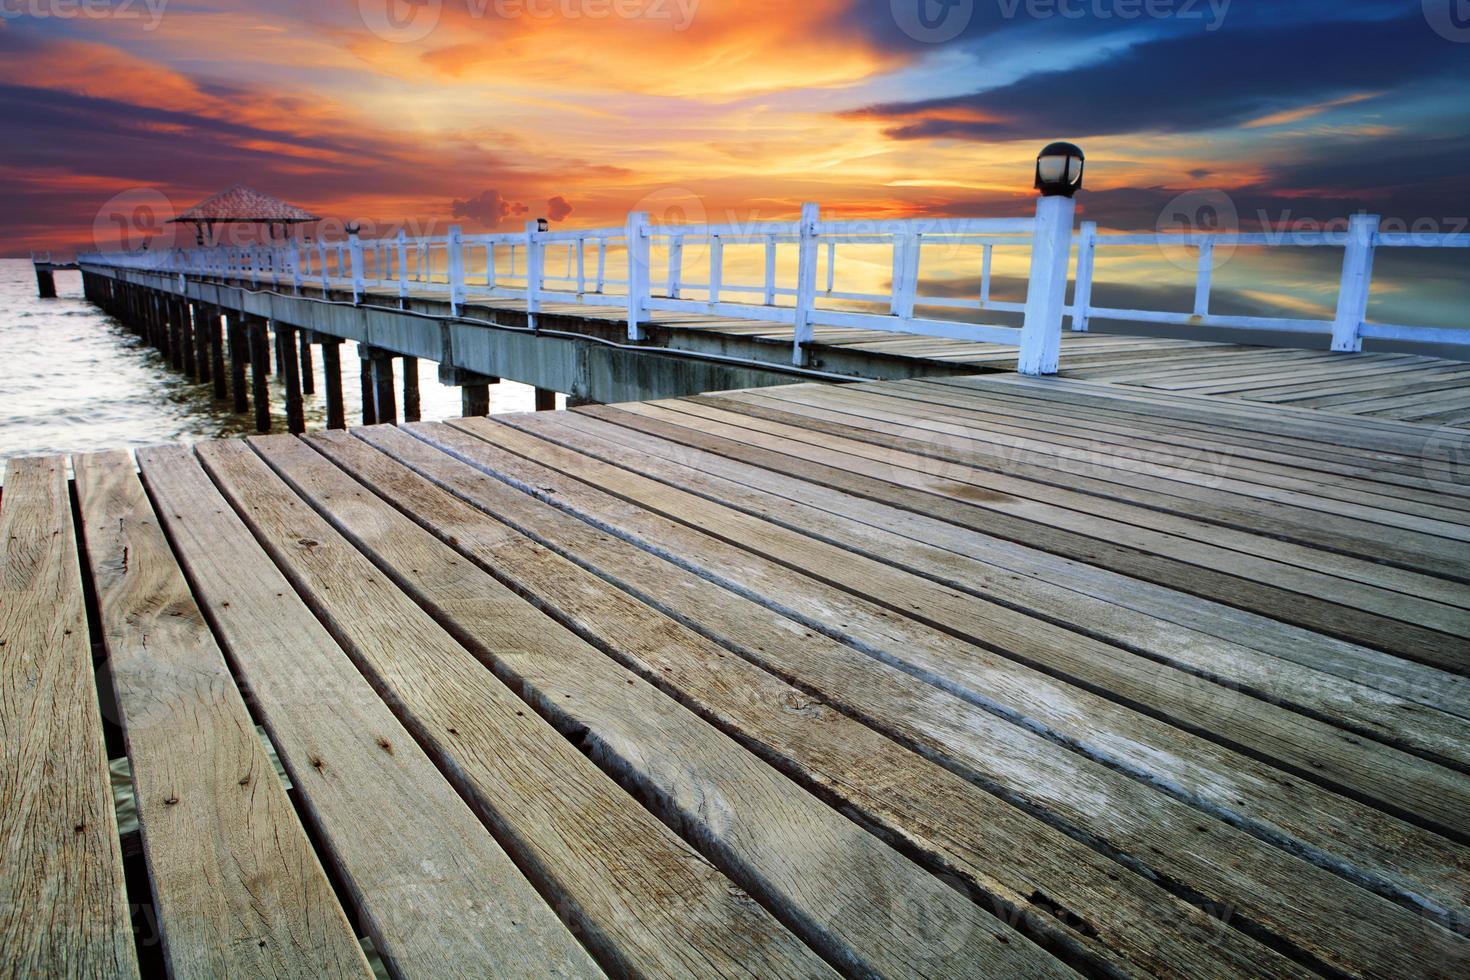 schöne alte Holzbrücke am Strand mit Sonnenuntergang Himmel foto